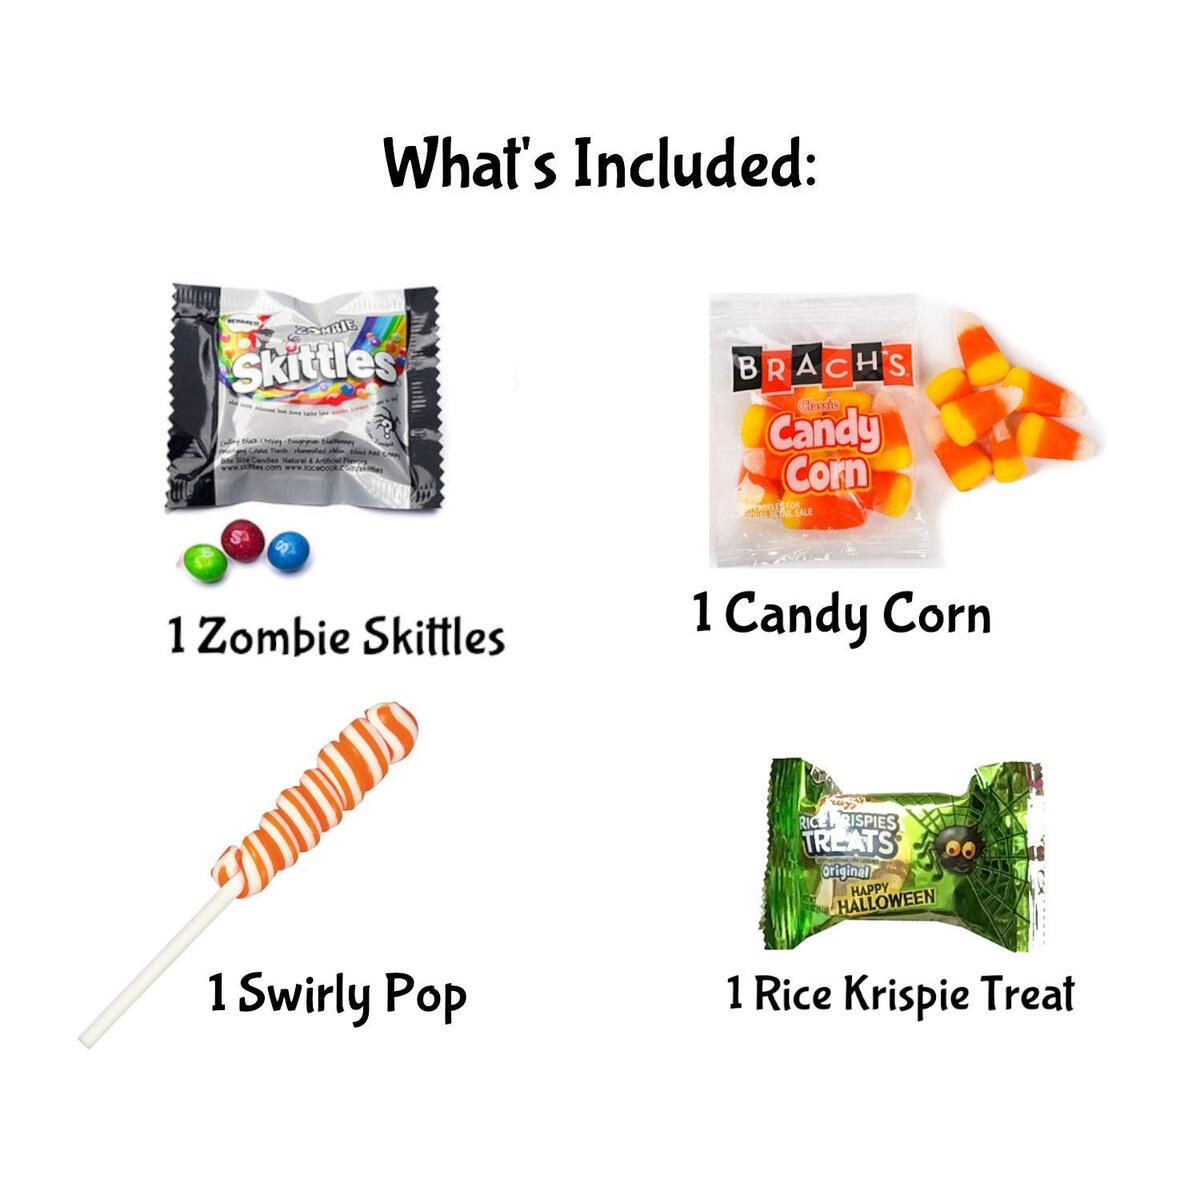 Halloween Basket For Teens - Movie Night Spooky Basket With Candy Plus Free Redbox Movie Rental Code Card